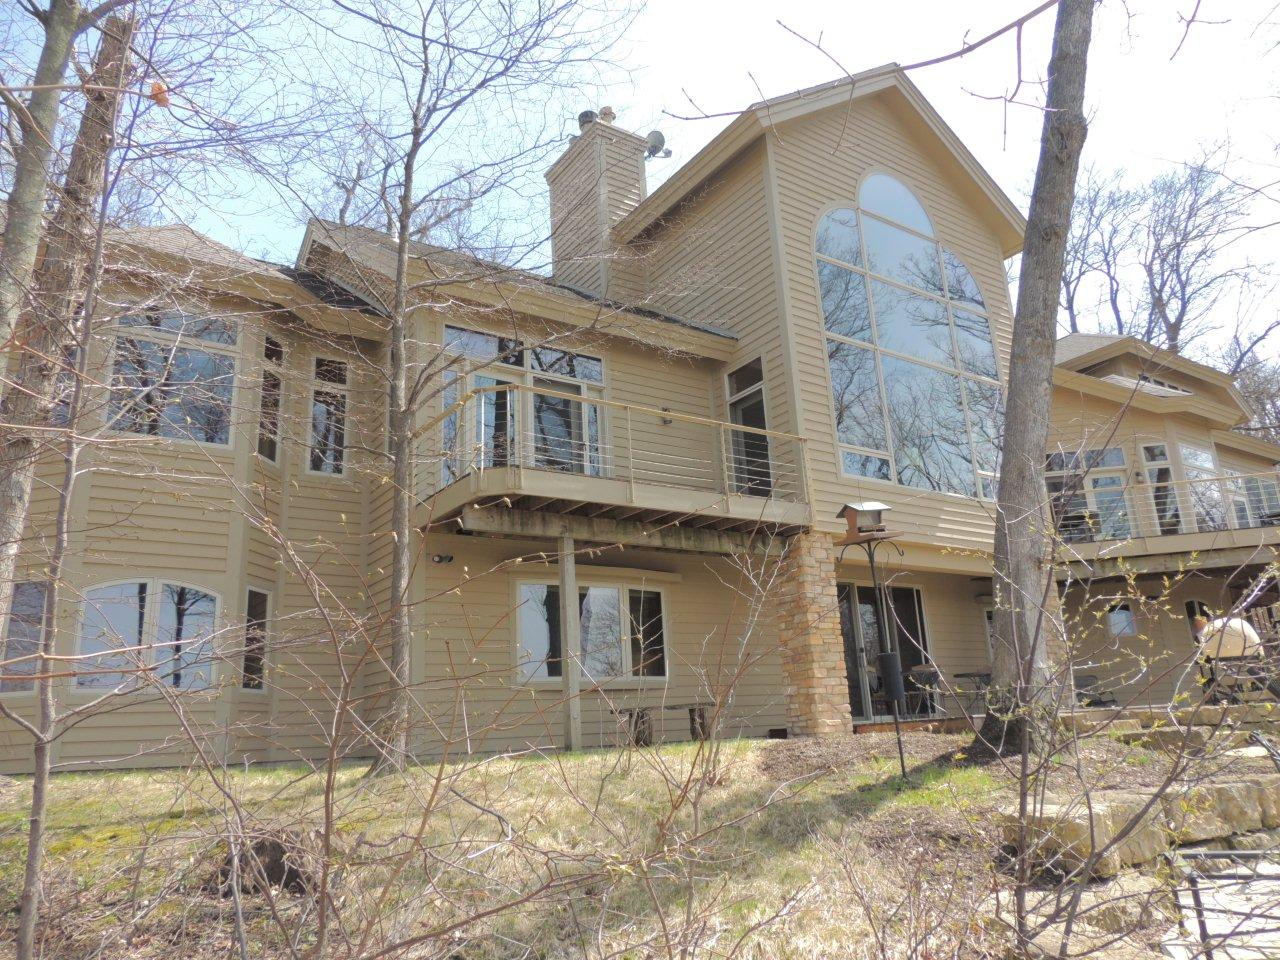 8624 Fischer Road, Hanover, Illinois 61041